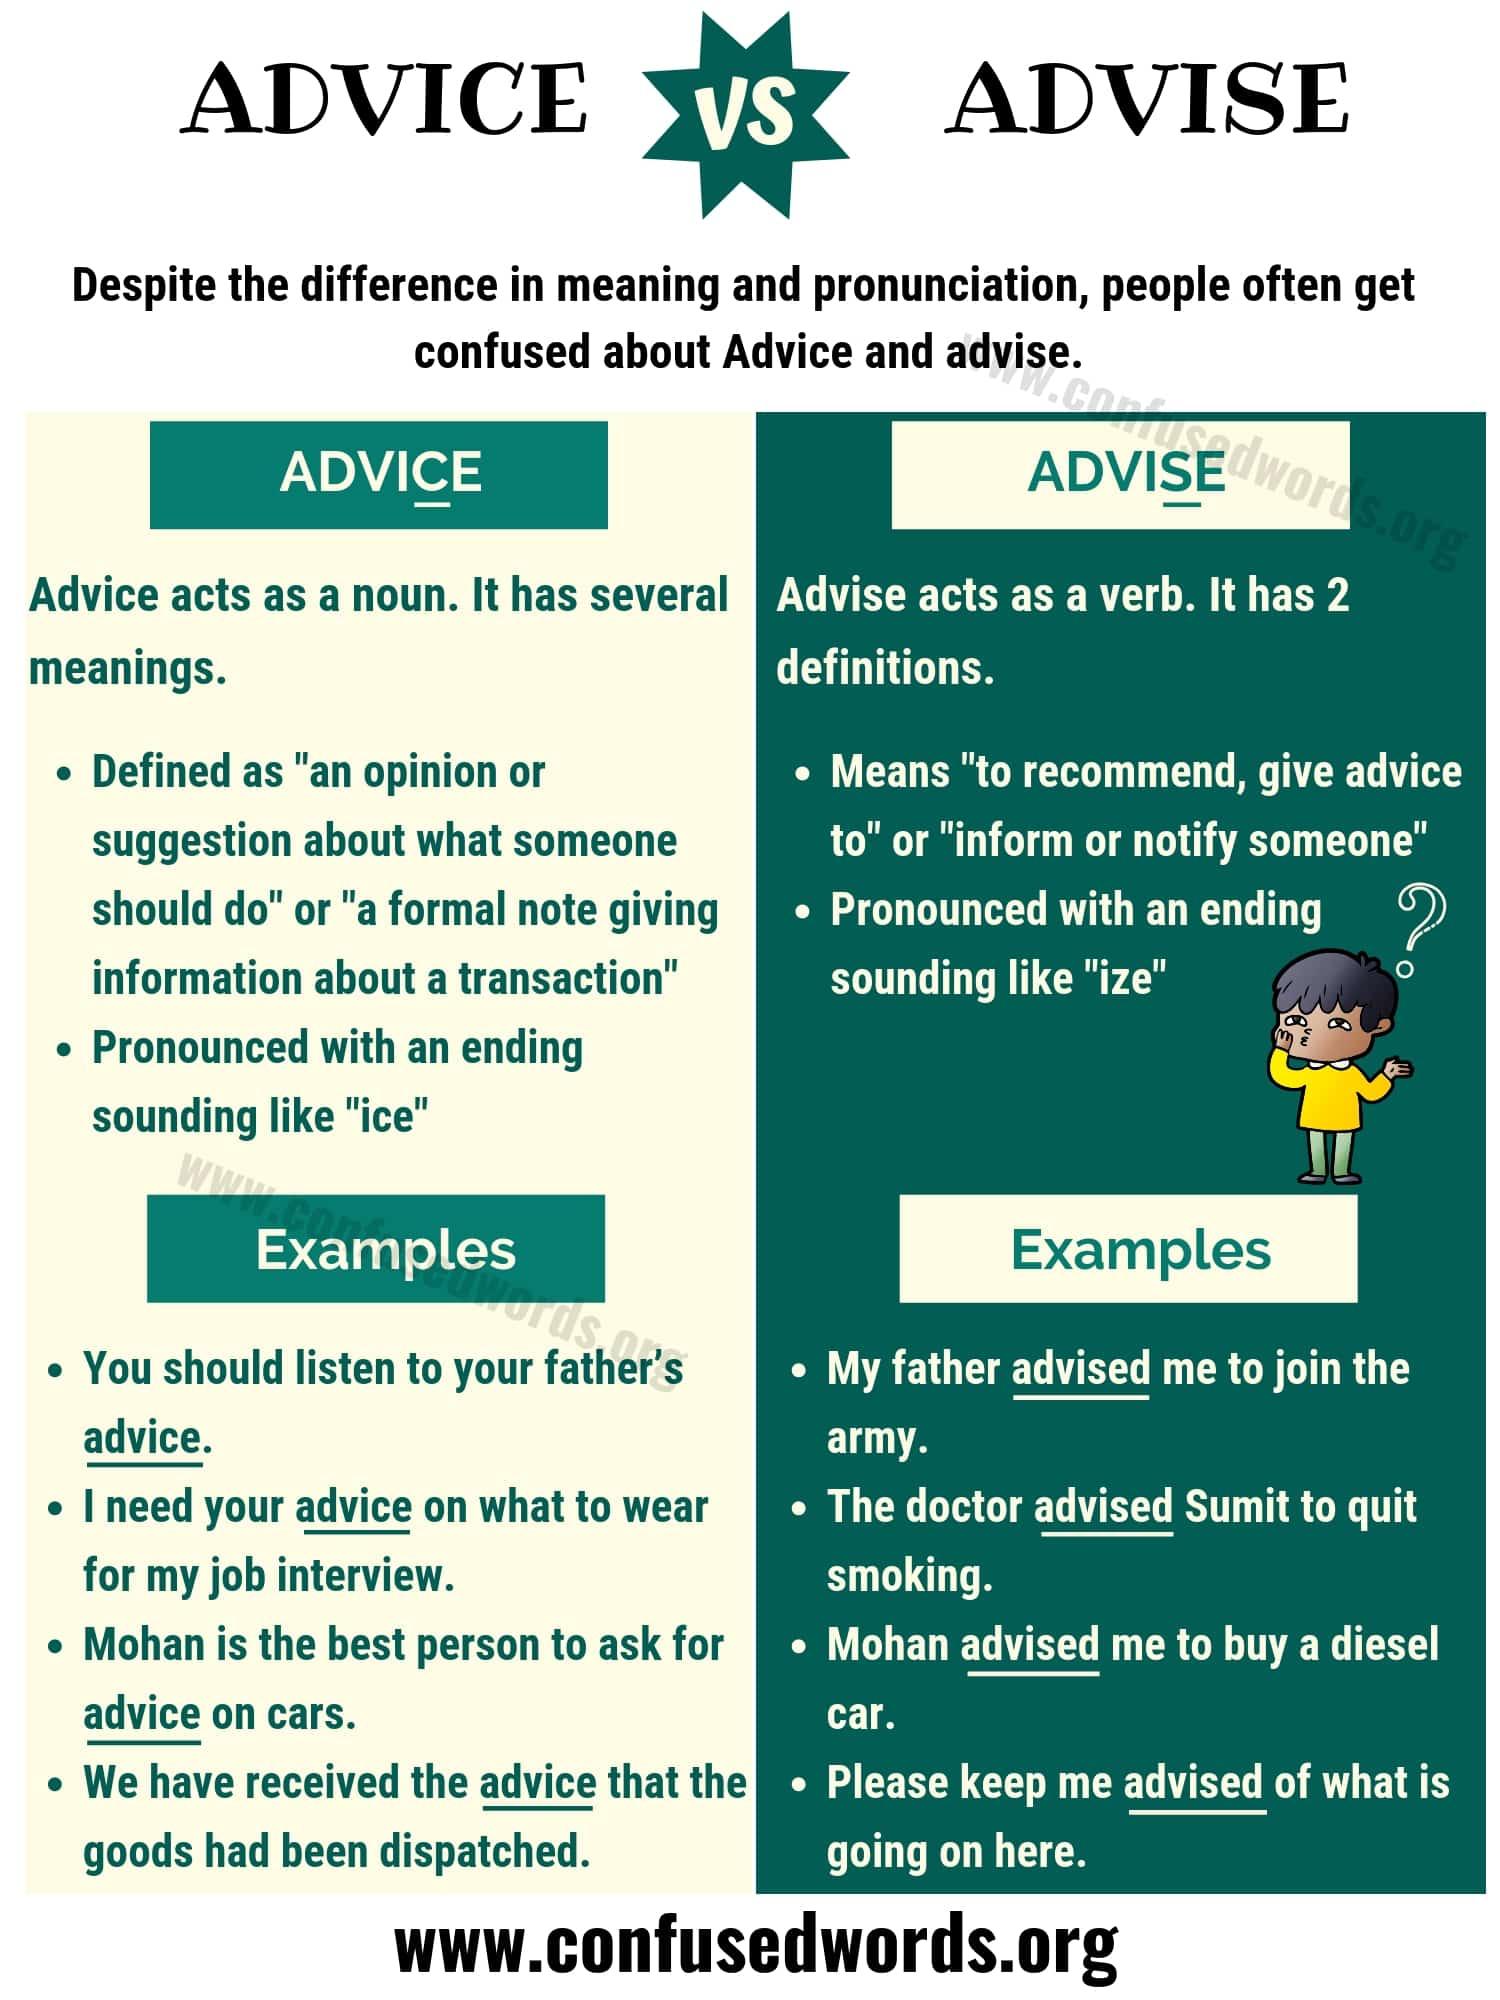 ADVICE vs ADVISE